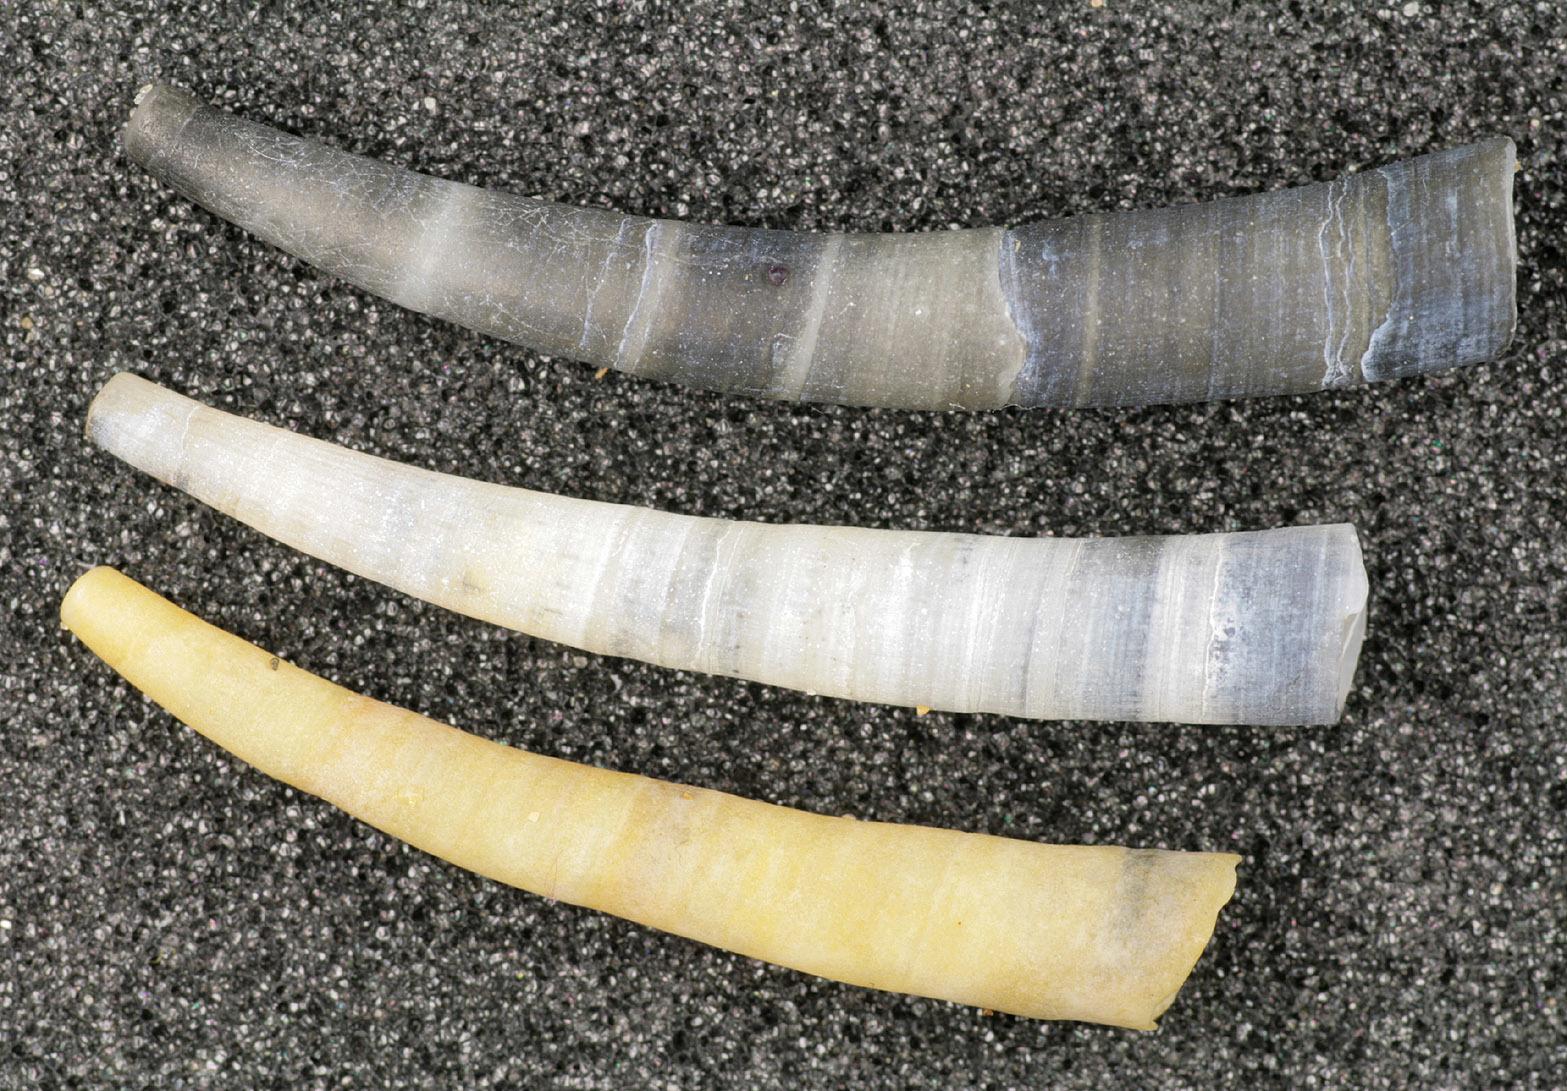 Image of common elephant's tusk